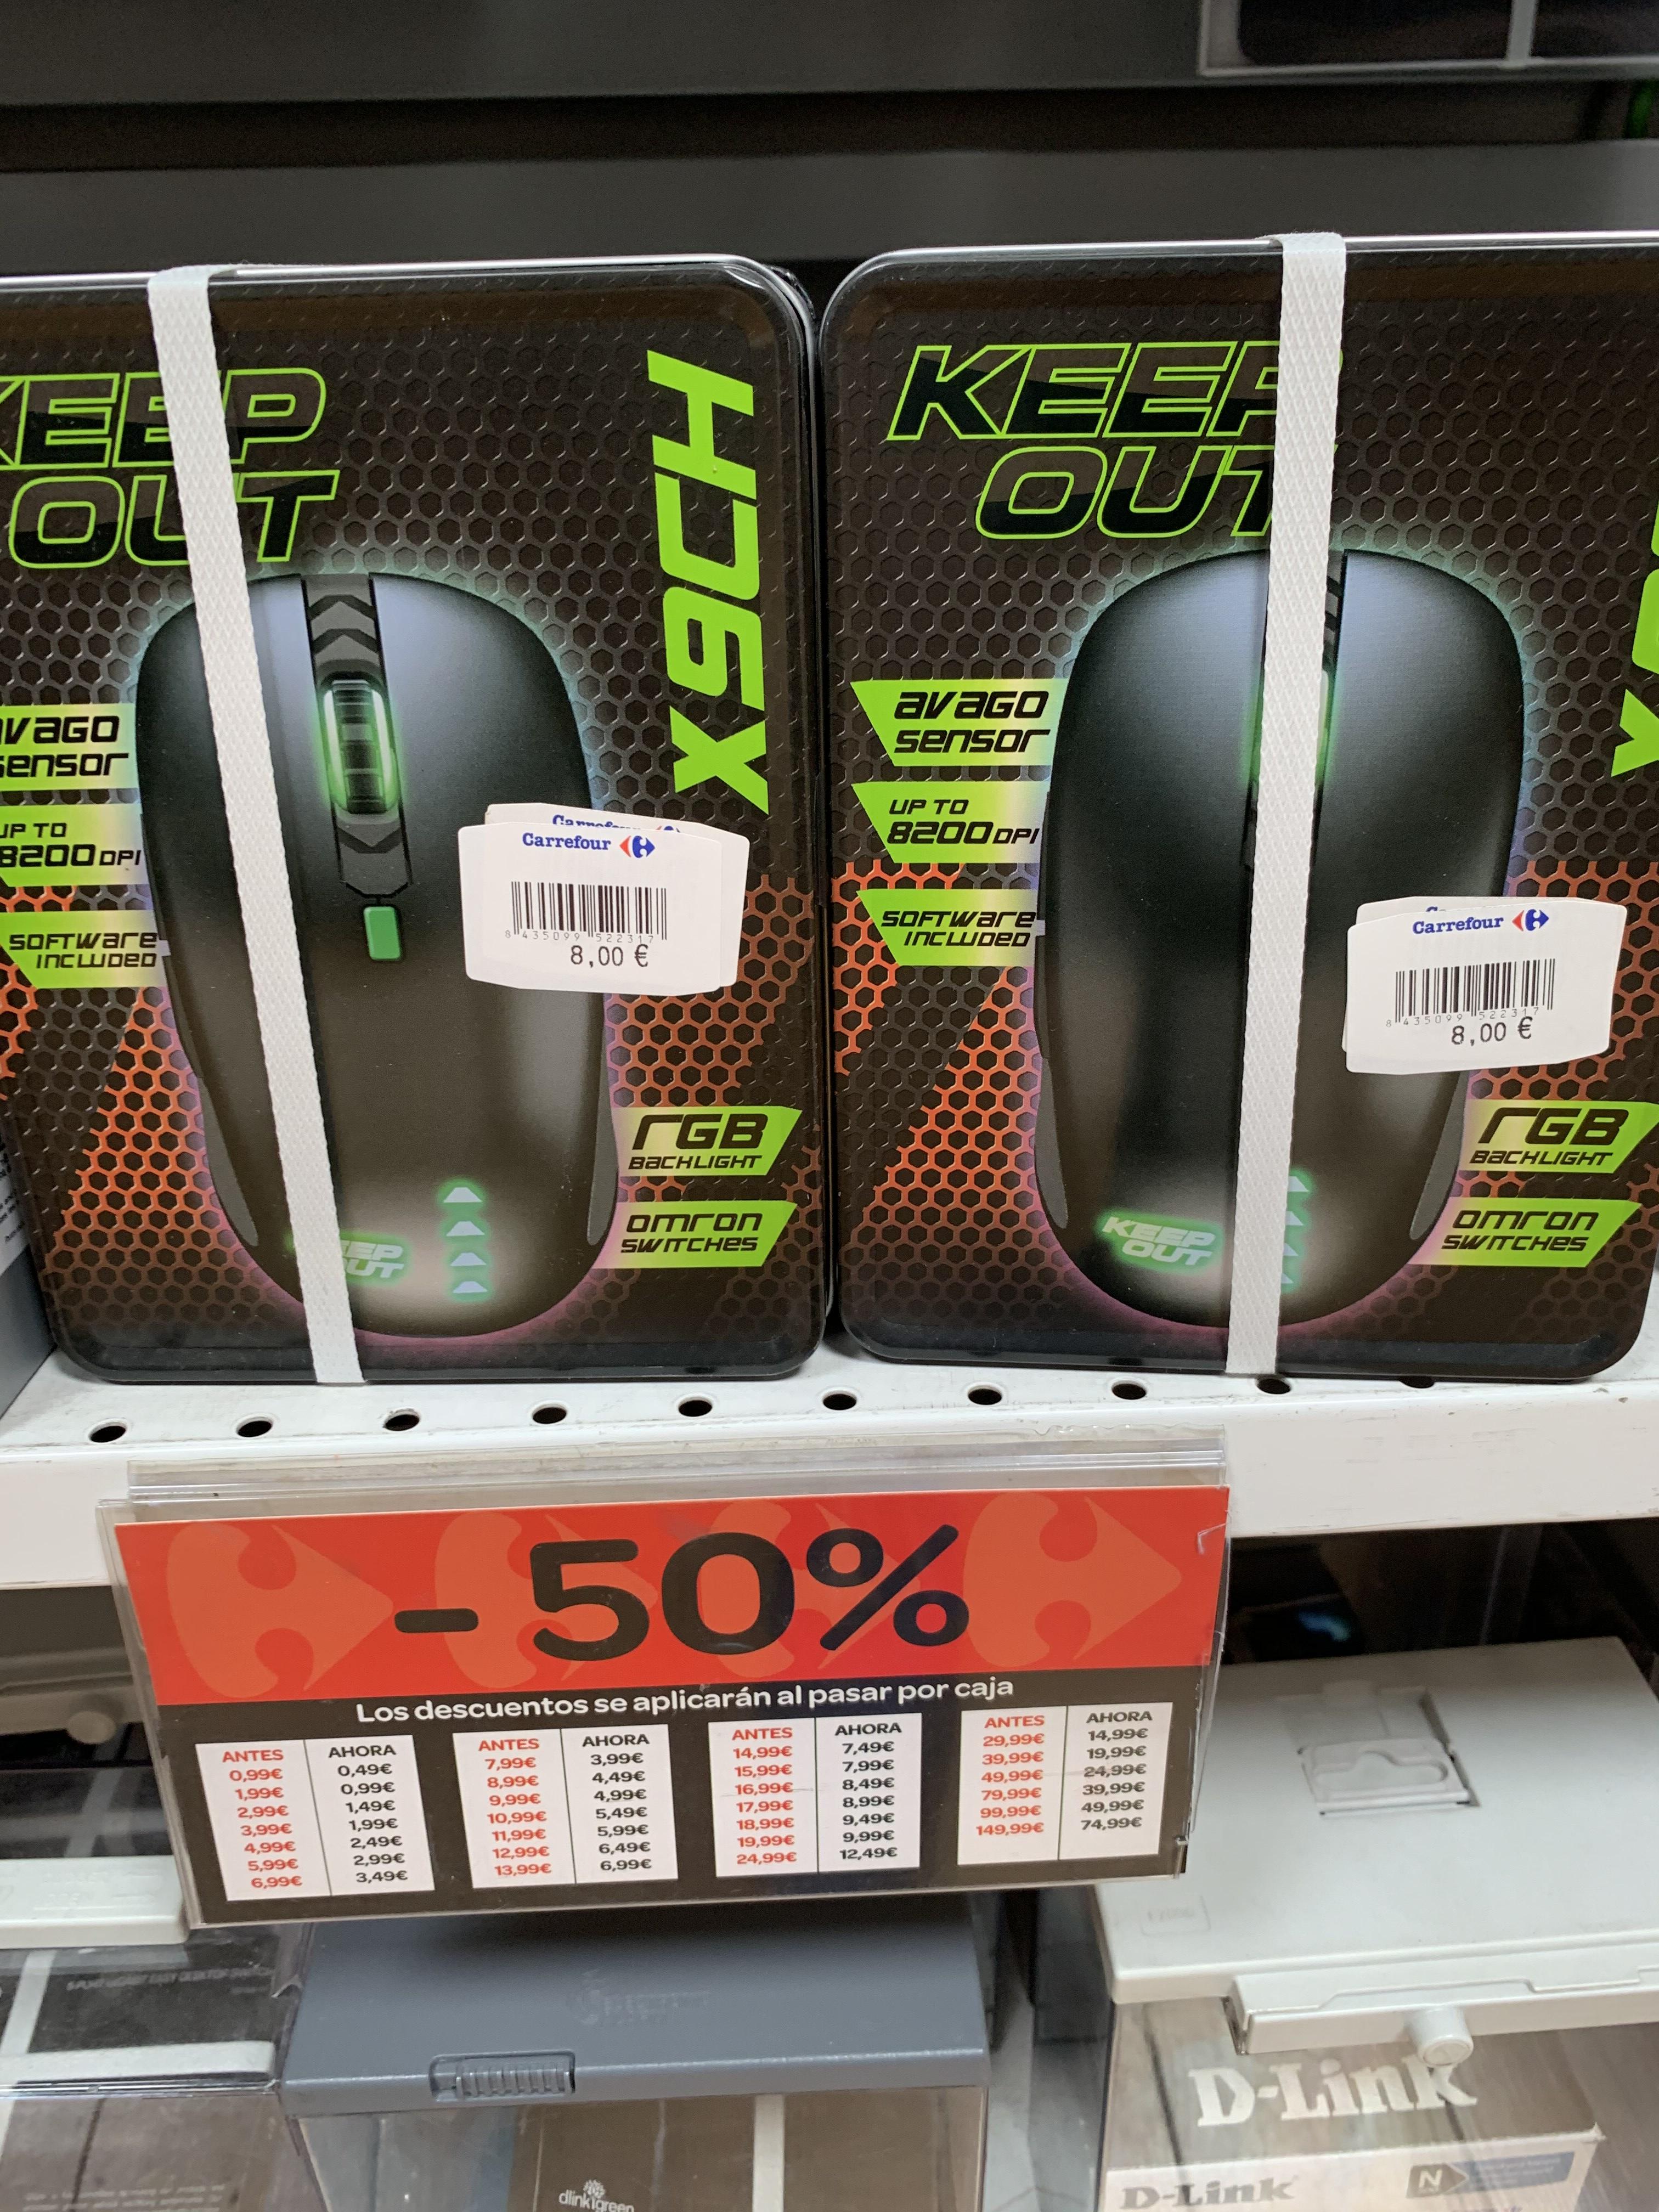 Ratón Keep Out Gaming X9CH 8200dpi (Carrefour Atalayas, Murcia)